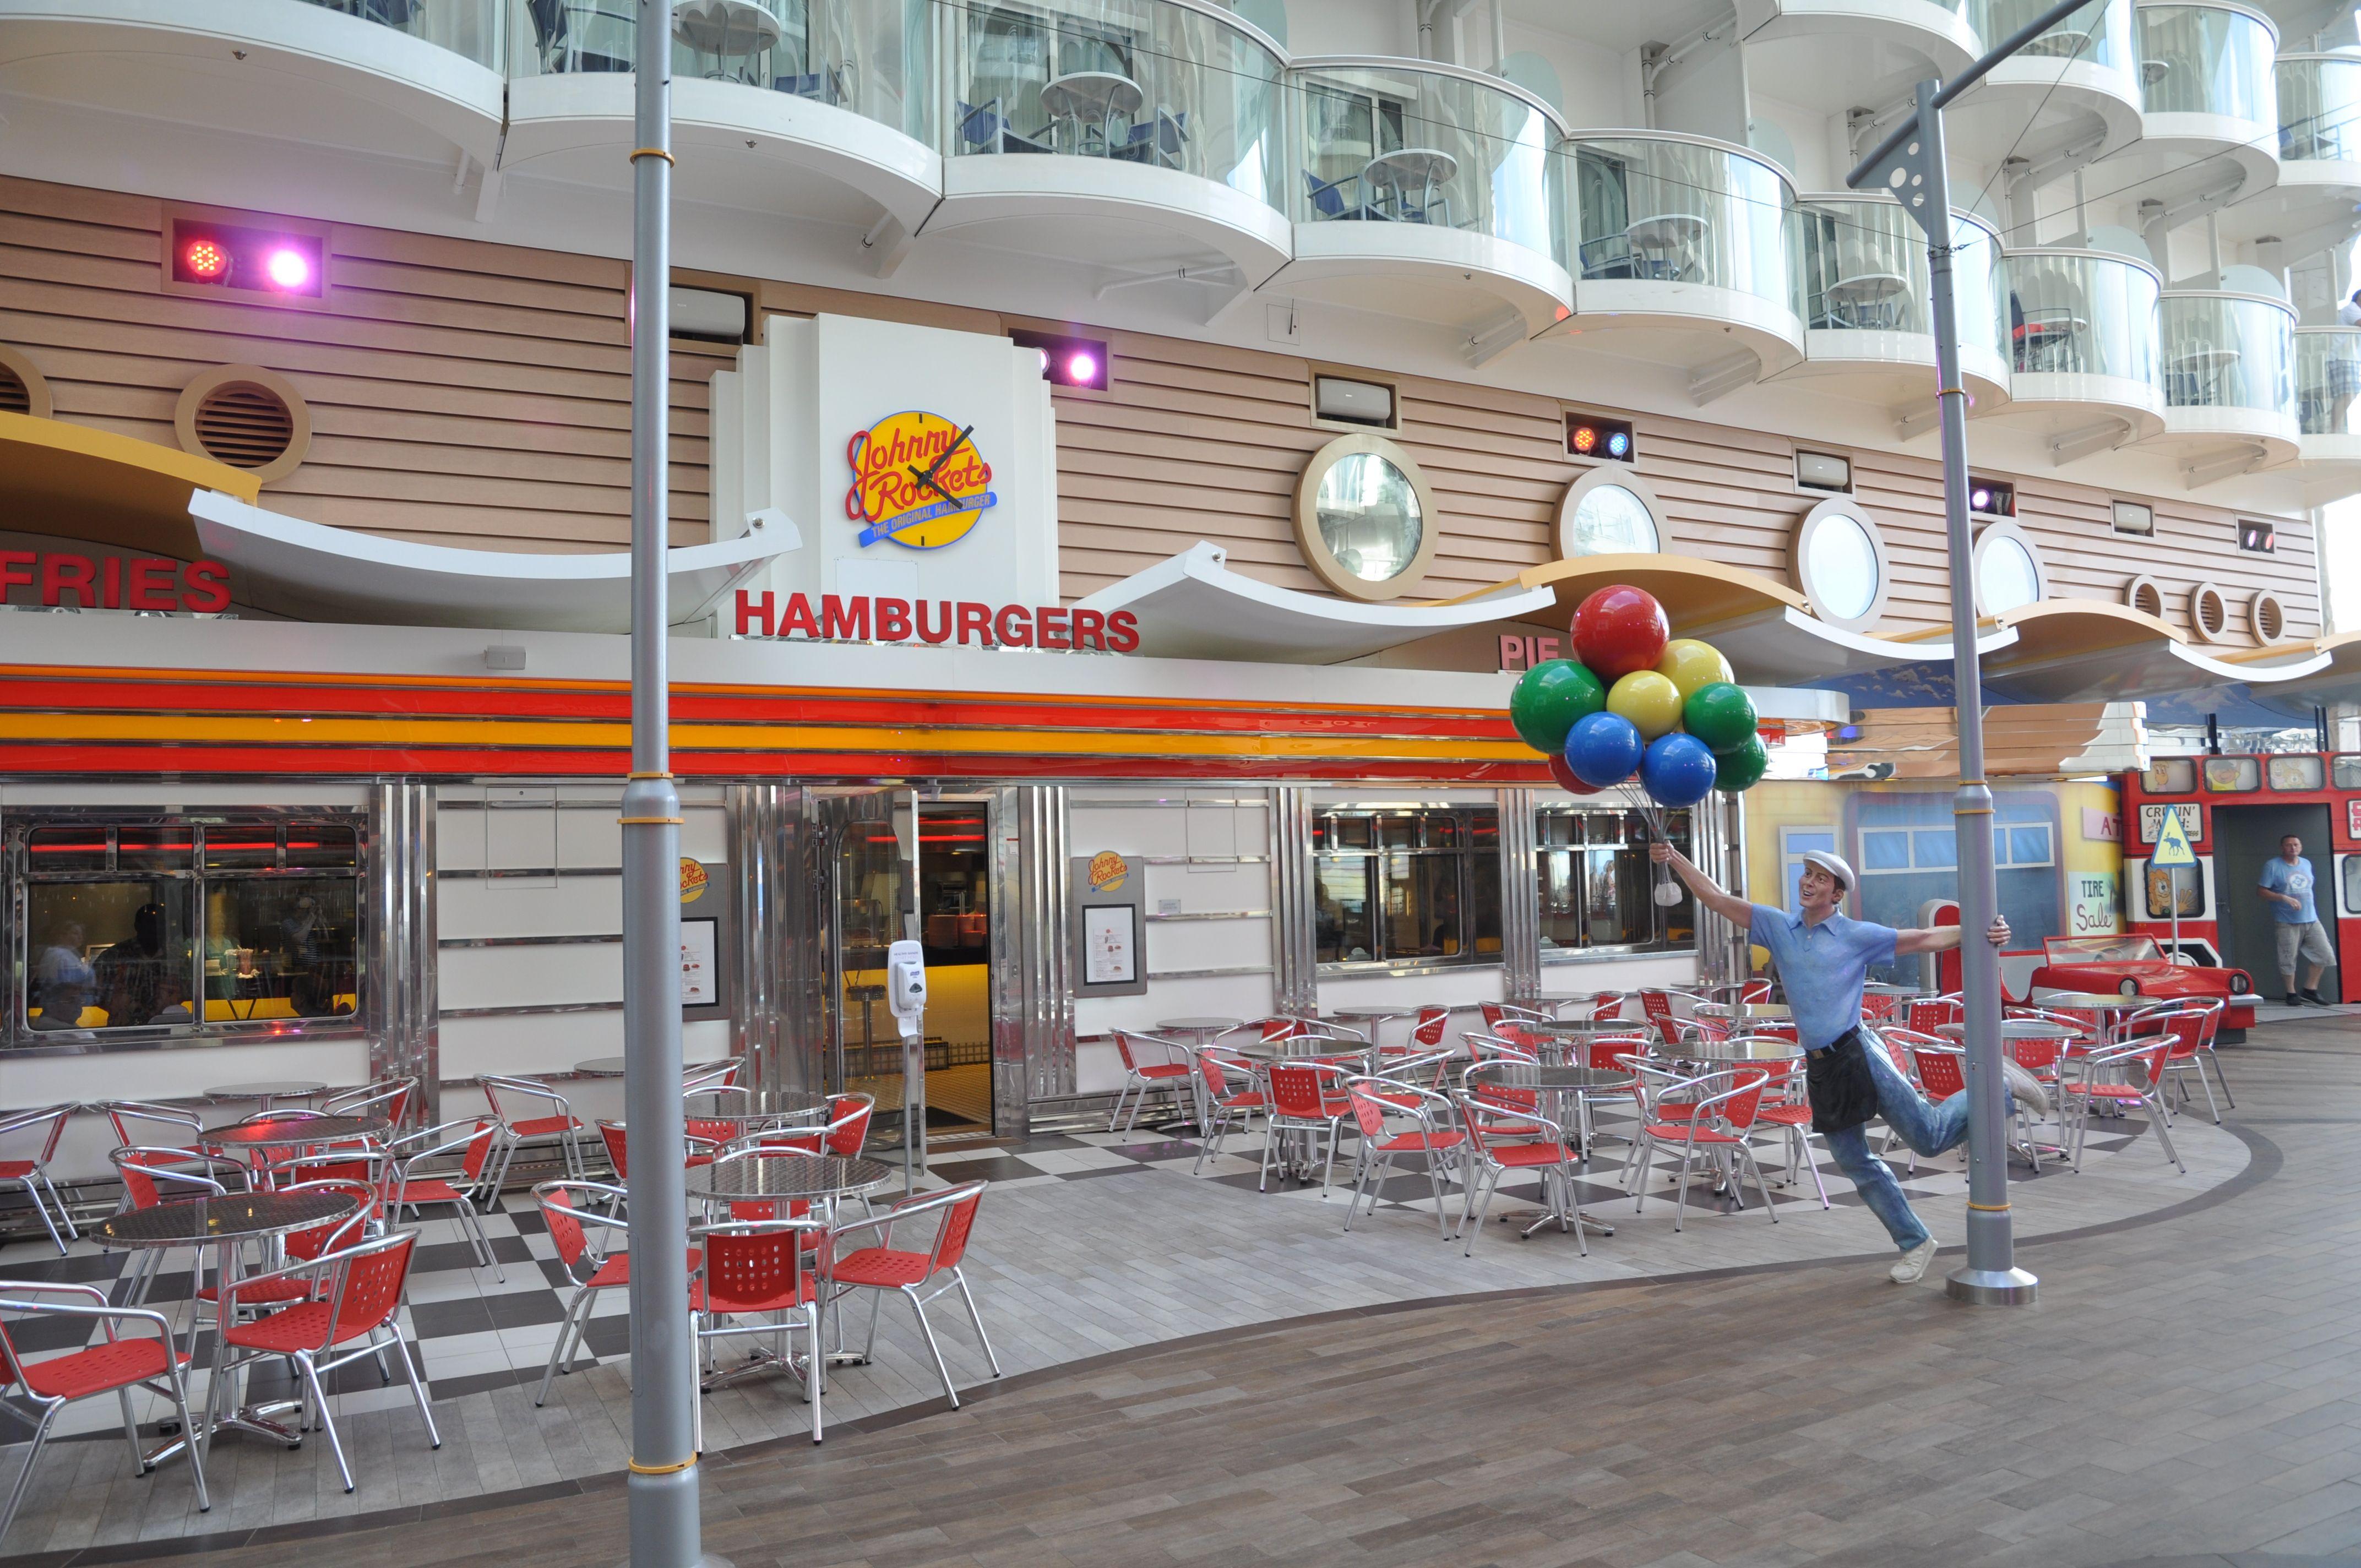 Johnny Rockets Restaurant On Boardwalk Royal Caribbean S Oasis